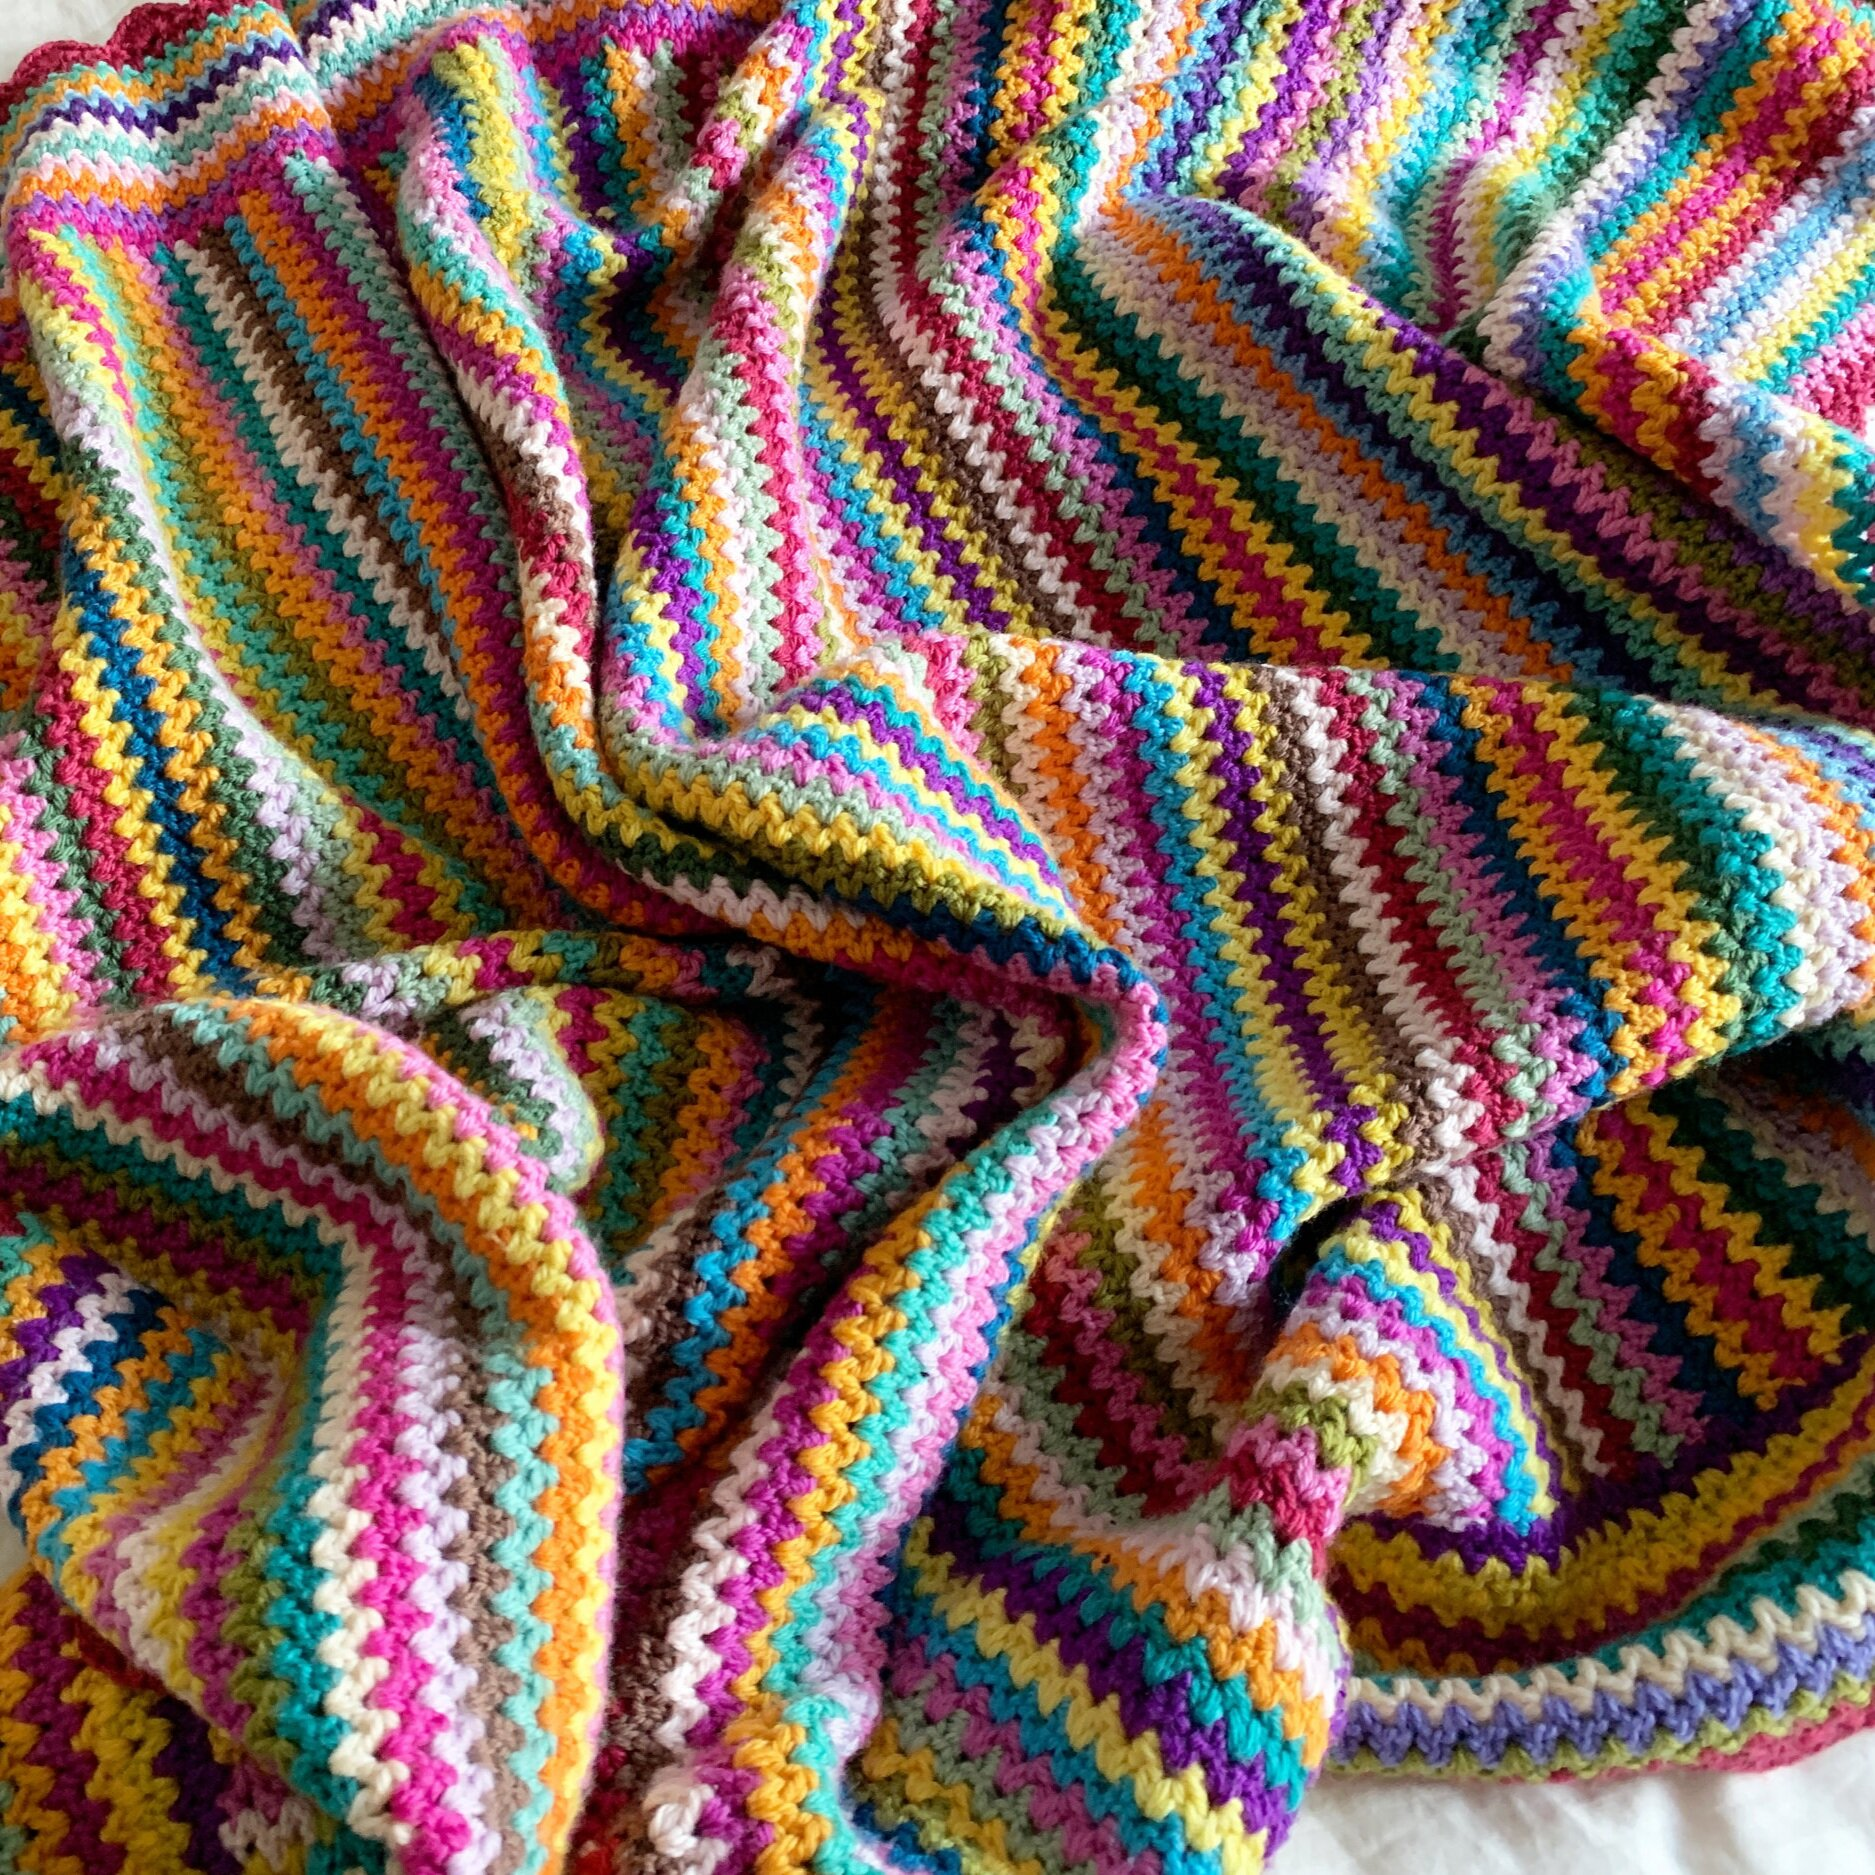 Crochet Blankets -